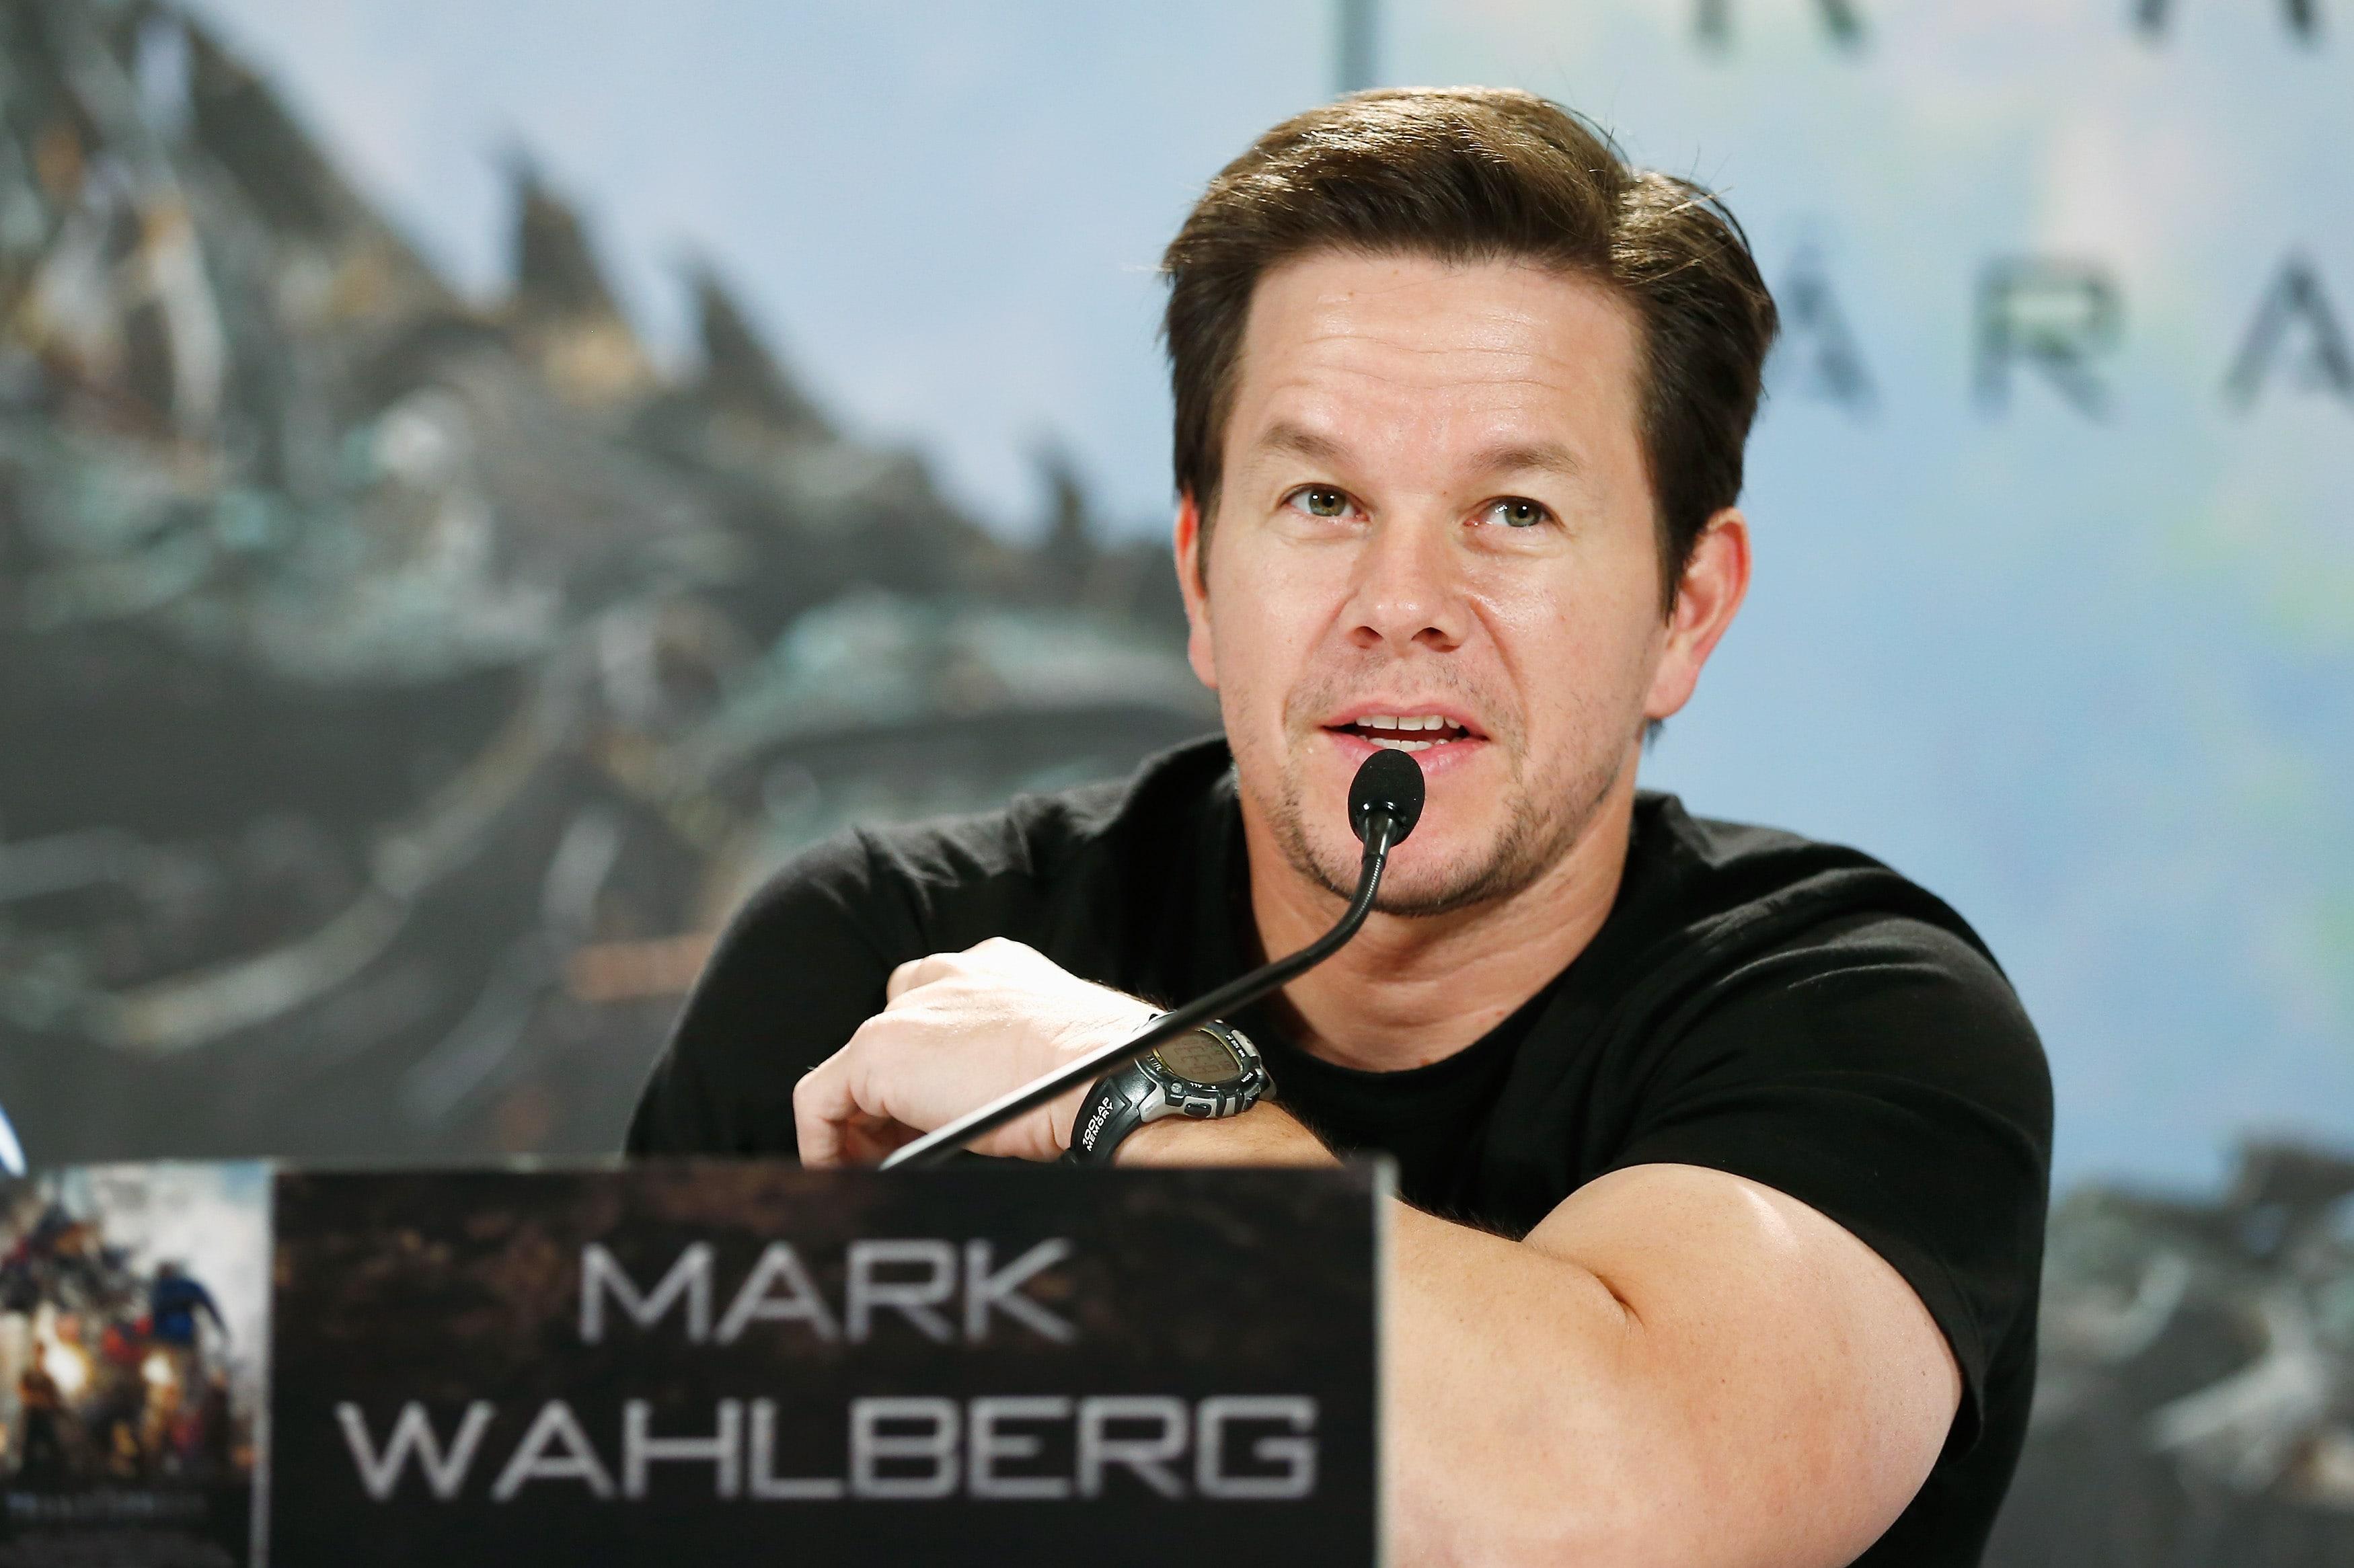 Mark Wahlberg HD